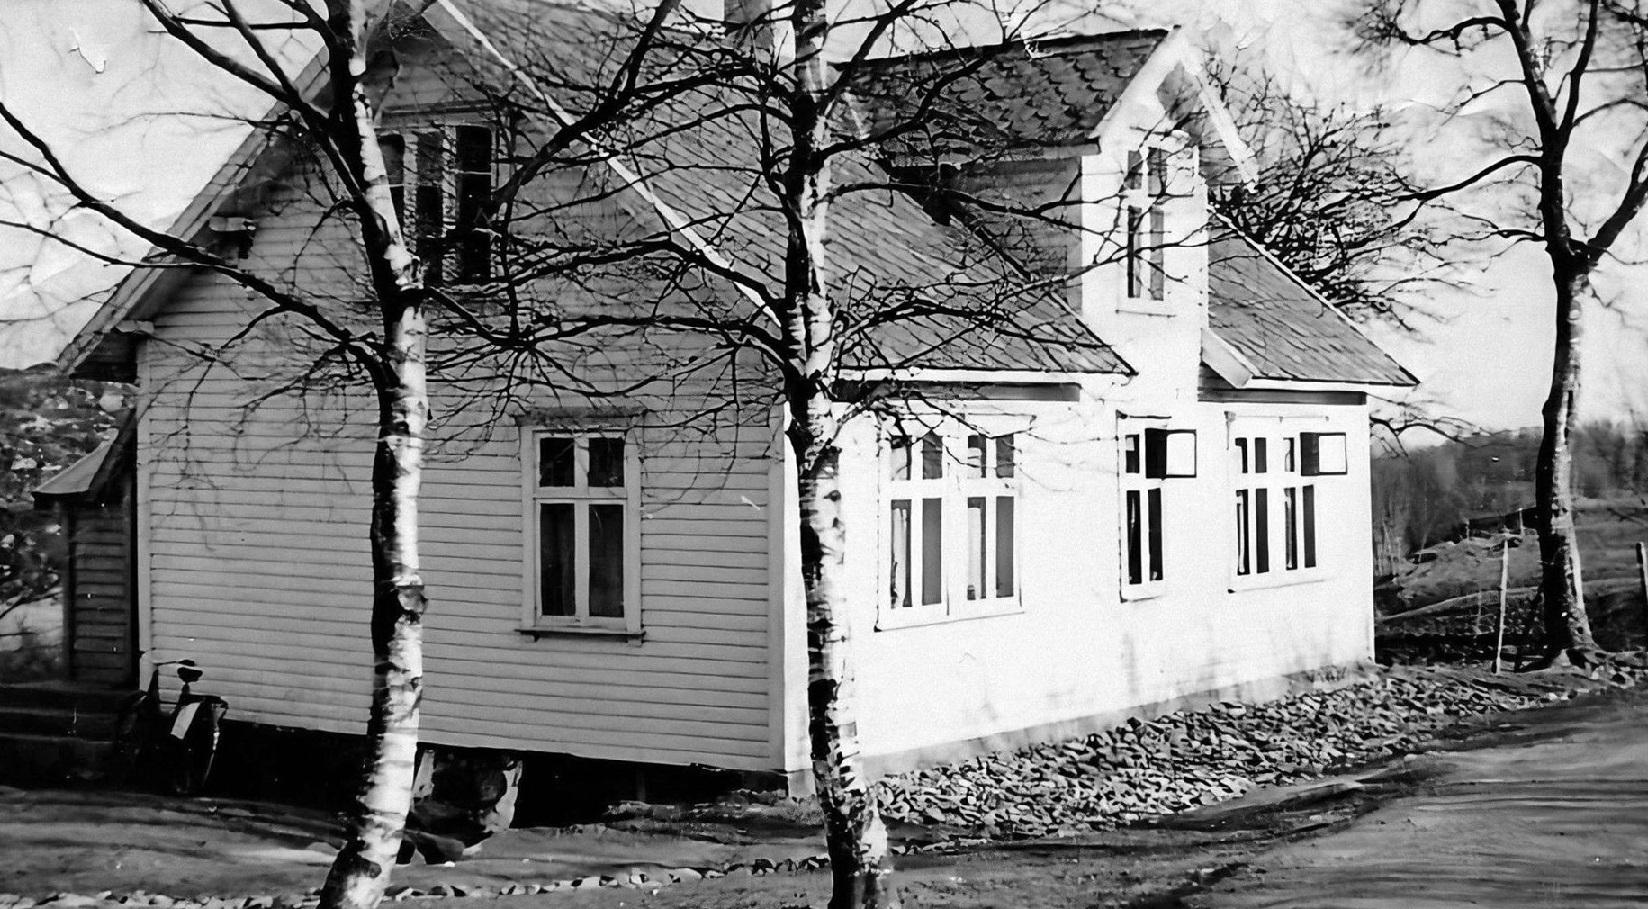 Huset på Dagsland bruk 4. Privat bilde. Fotograf Elmer Eikeland.